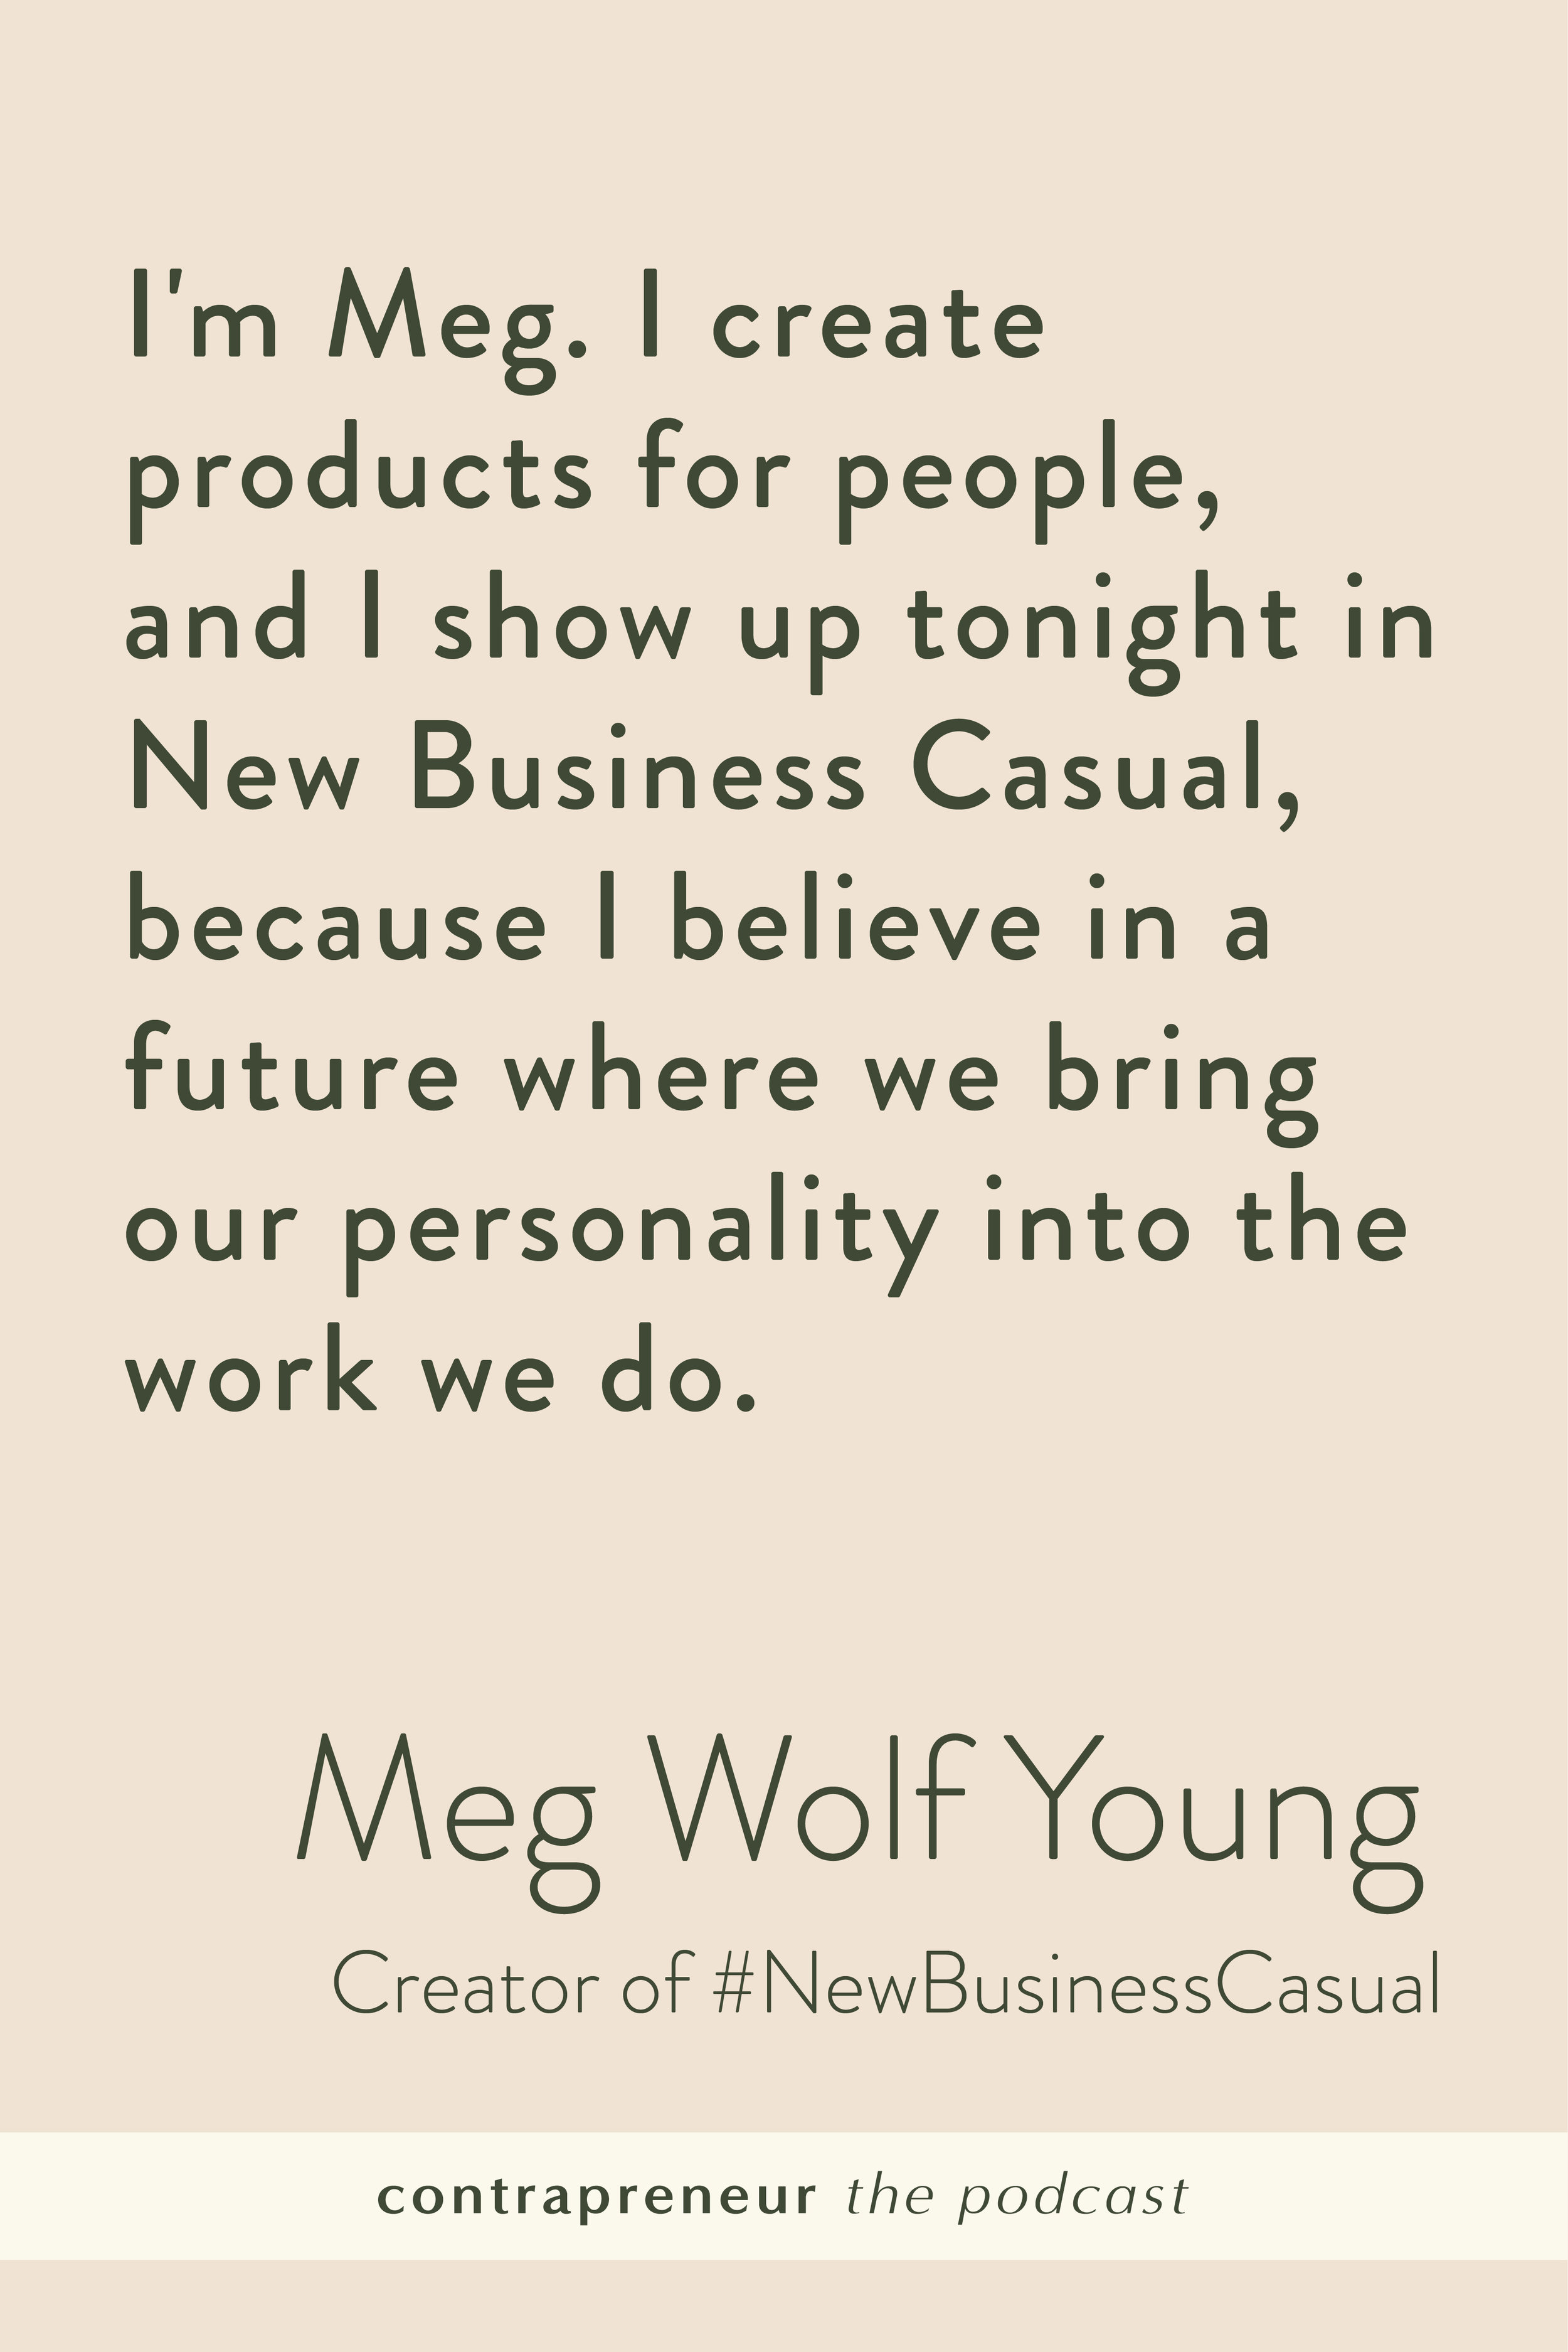 Contrapreneur The Podcast #NewBusinessCasual